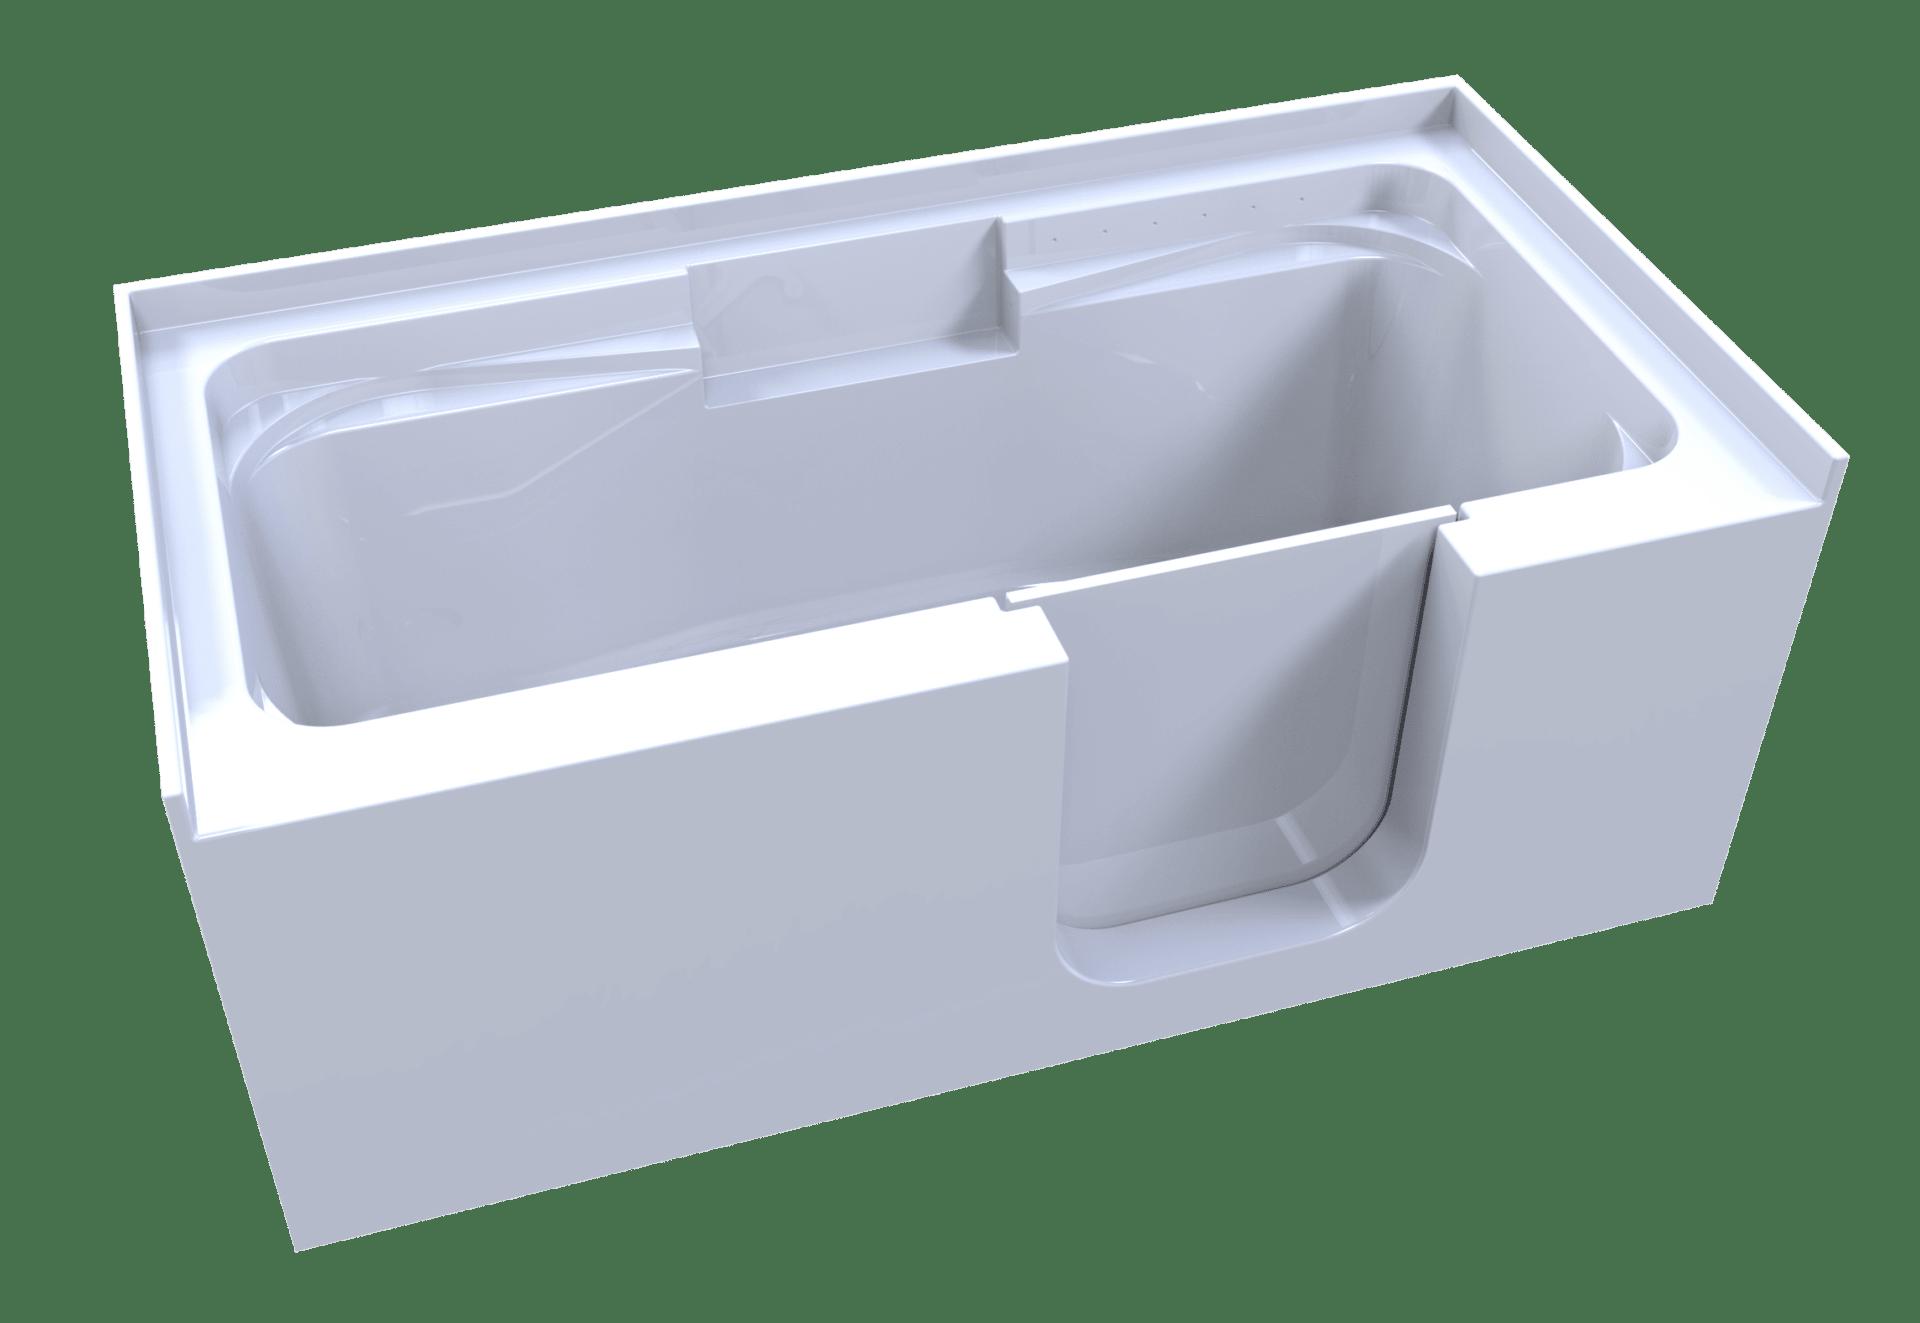 Safety Bath | The So-Lo Walk-in Tub with Inward-Swinging Door